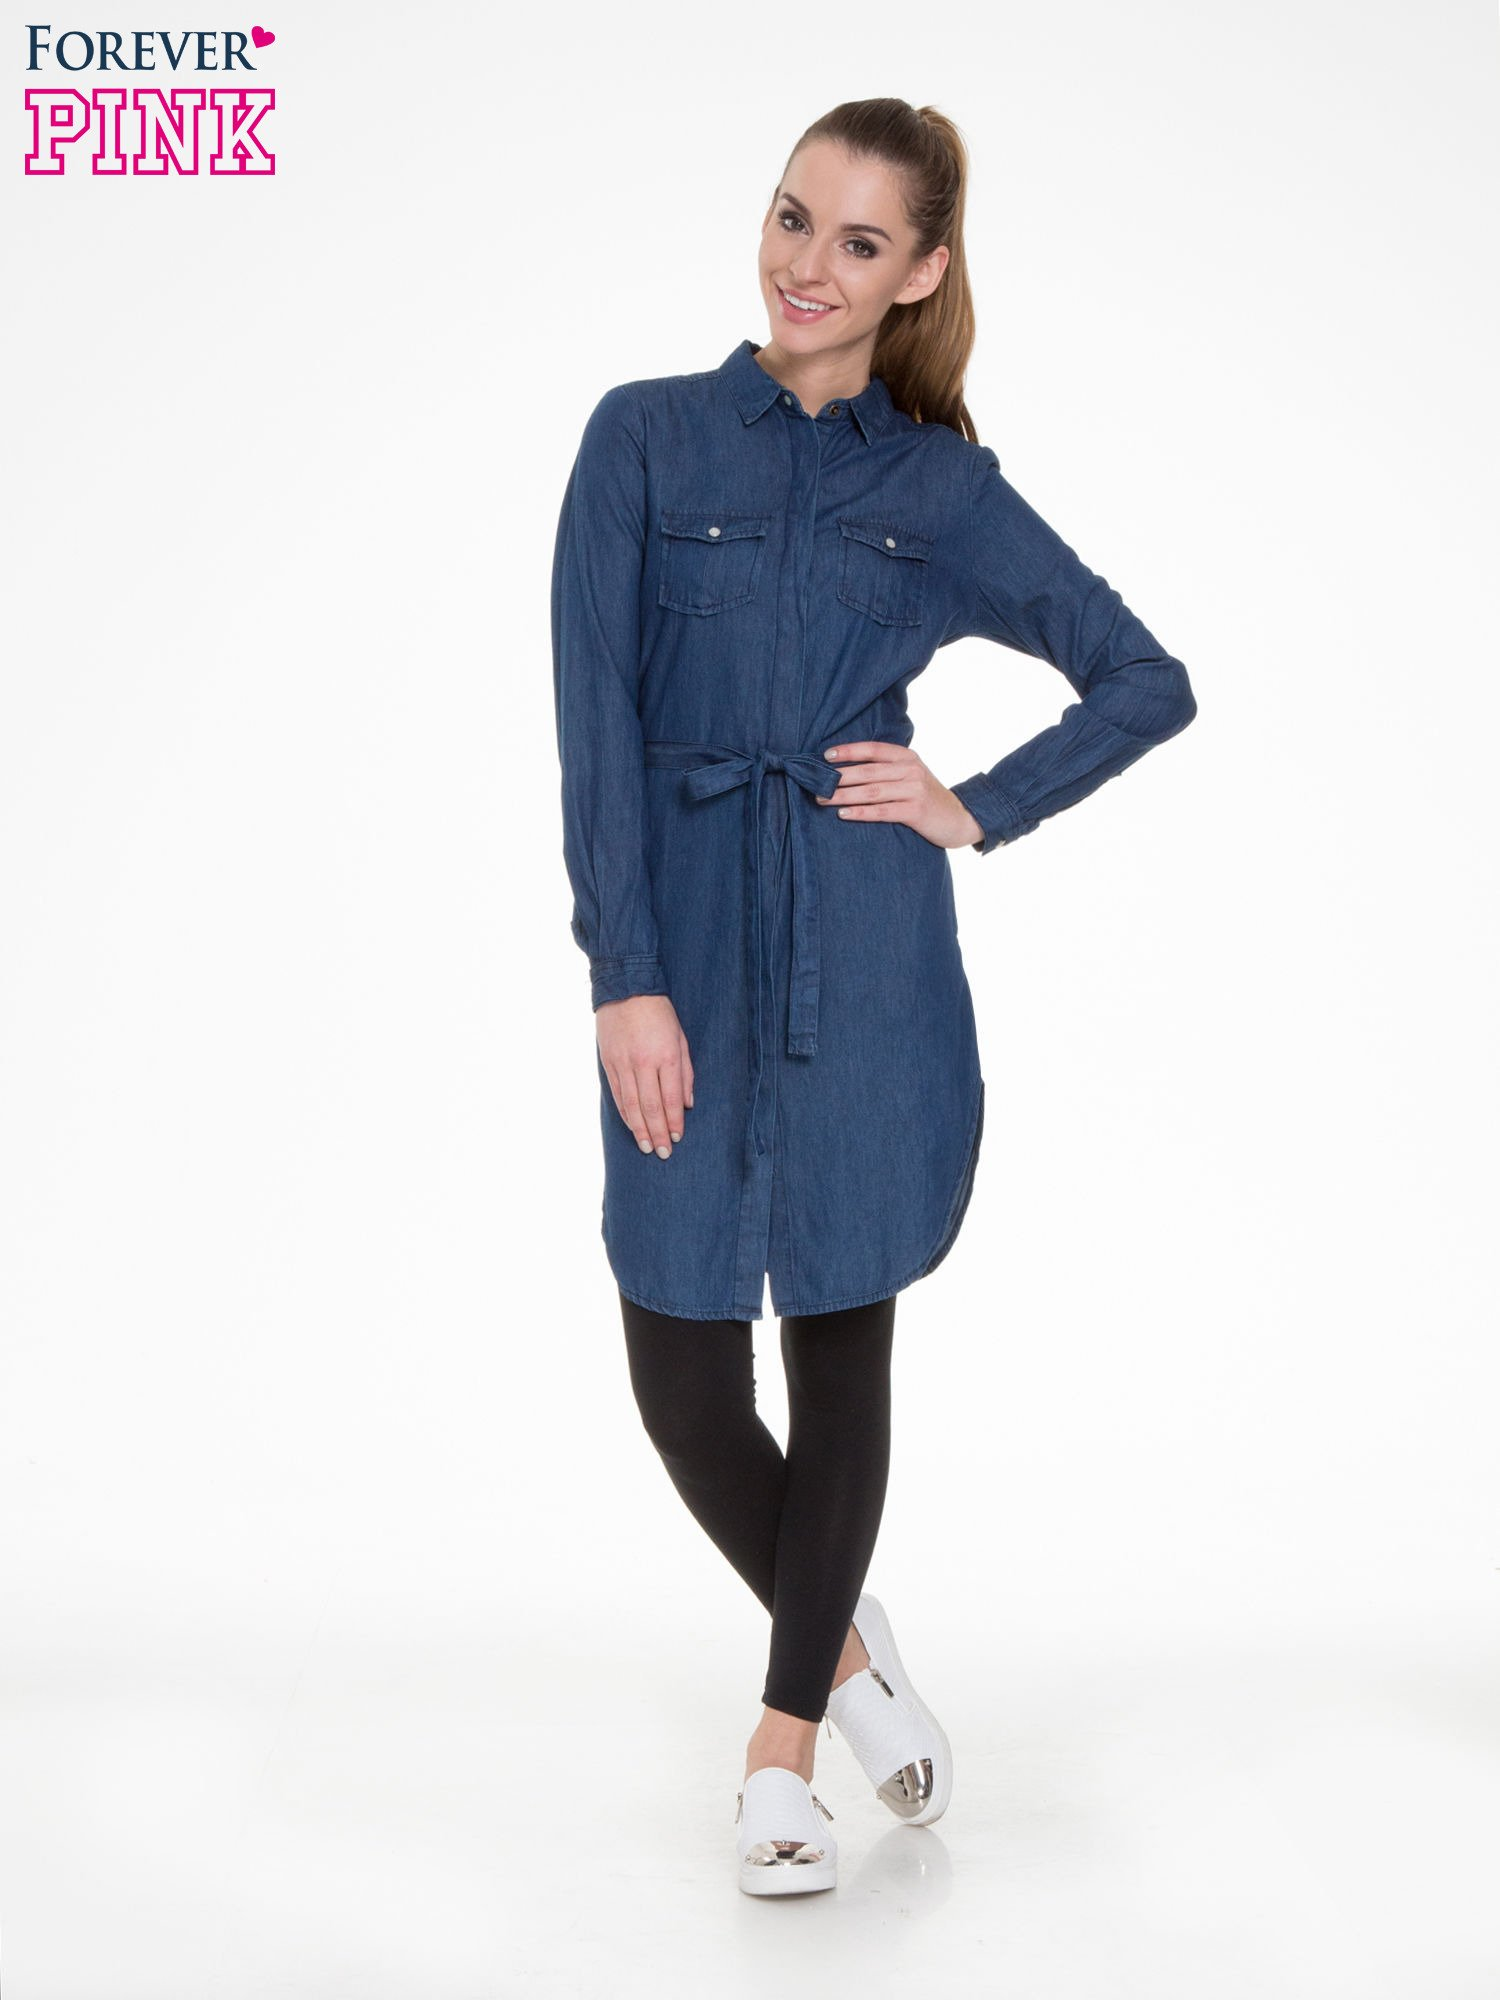 eacab41ca3 Niebieska jeansowa sukienka typu szmizjerka - Bluzka Tunika - sklep  eButik.pl